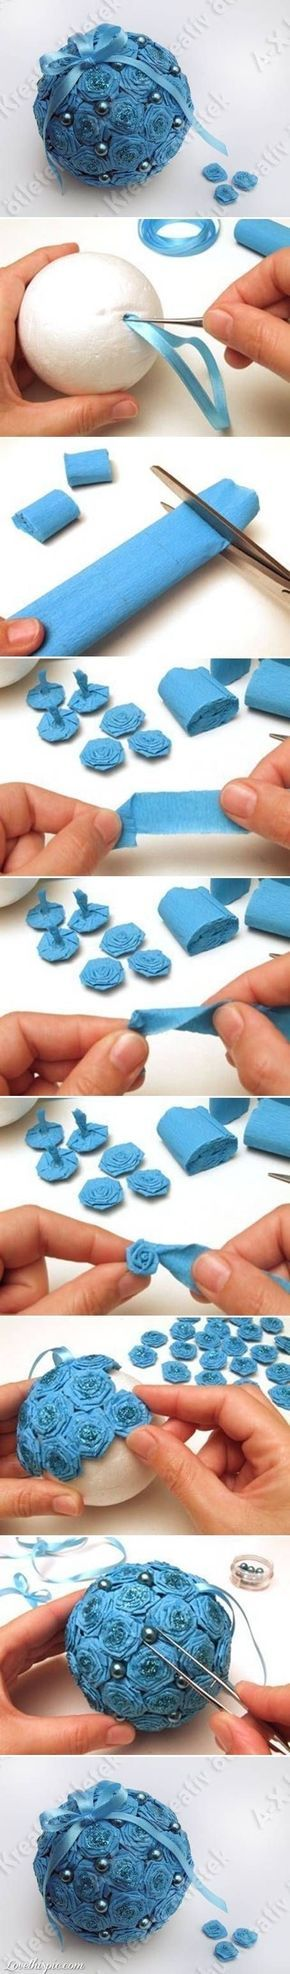 DIY Crepe Paper Flower Ball flowers diy crafts home made easy crafts craft idea crafts ideas diy ideas diy crafts diy idea do it yourself diy projects diy decor diy craft decorations